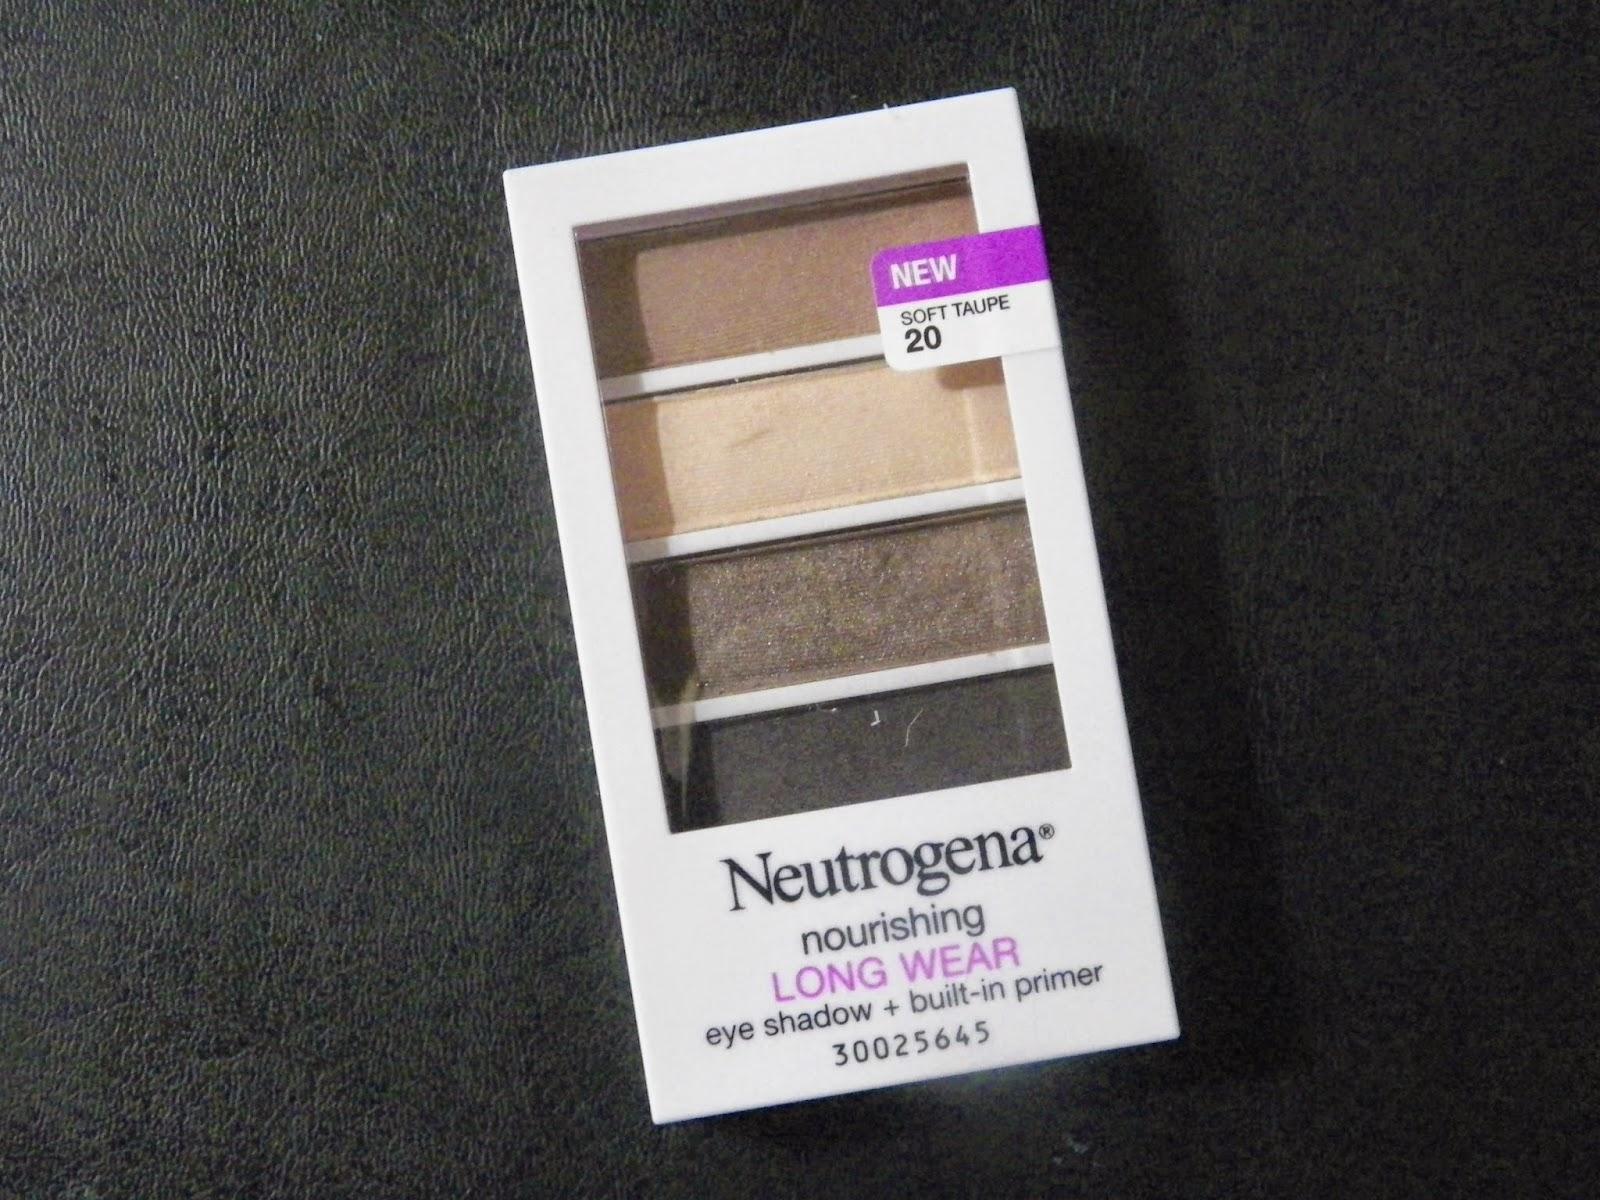 NeutrogenaNourishingLongWearEyeShadow+Primer.jpg